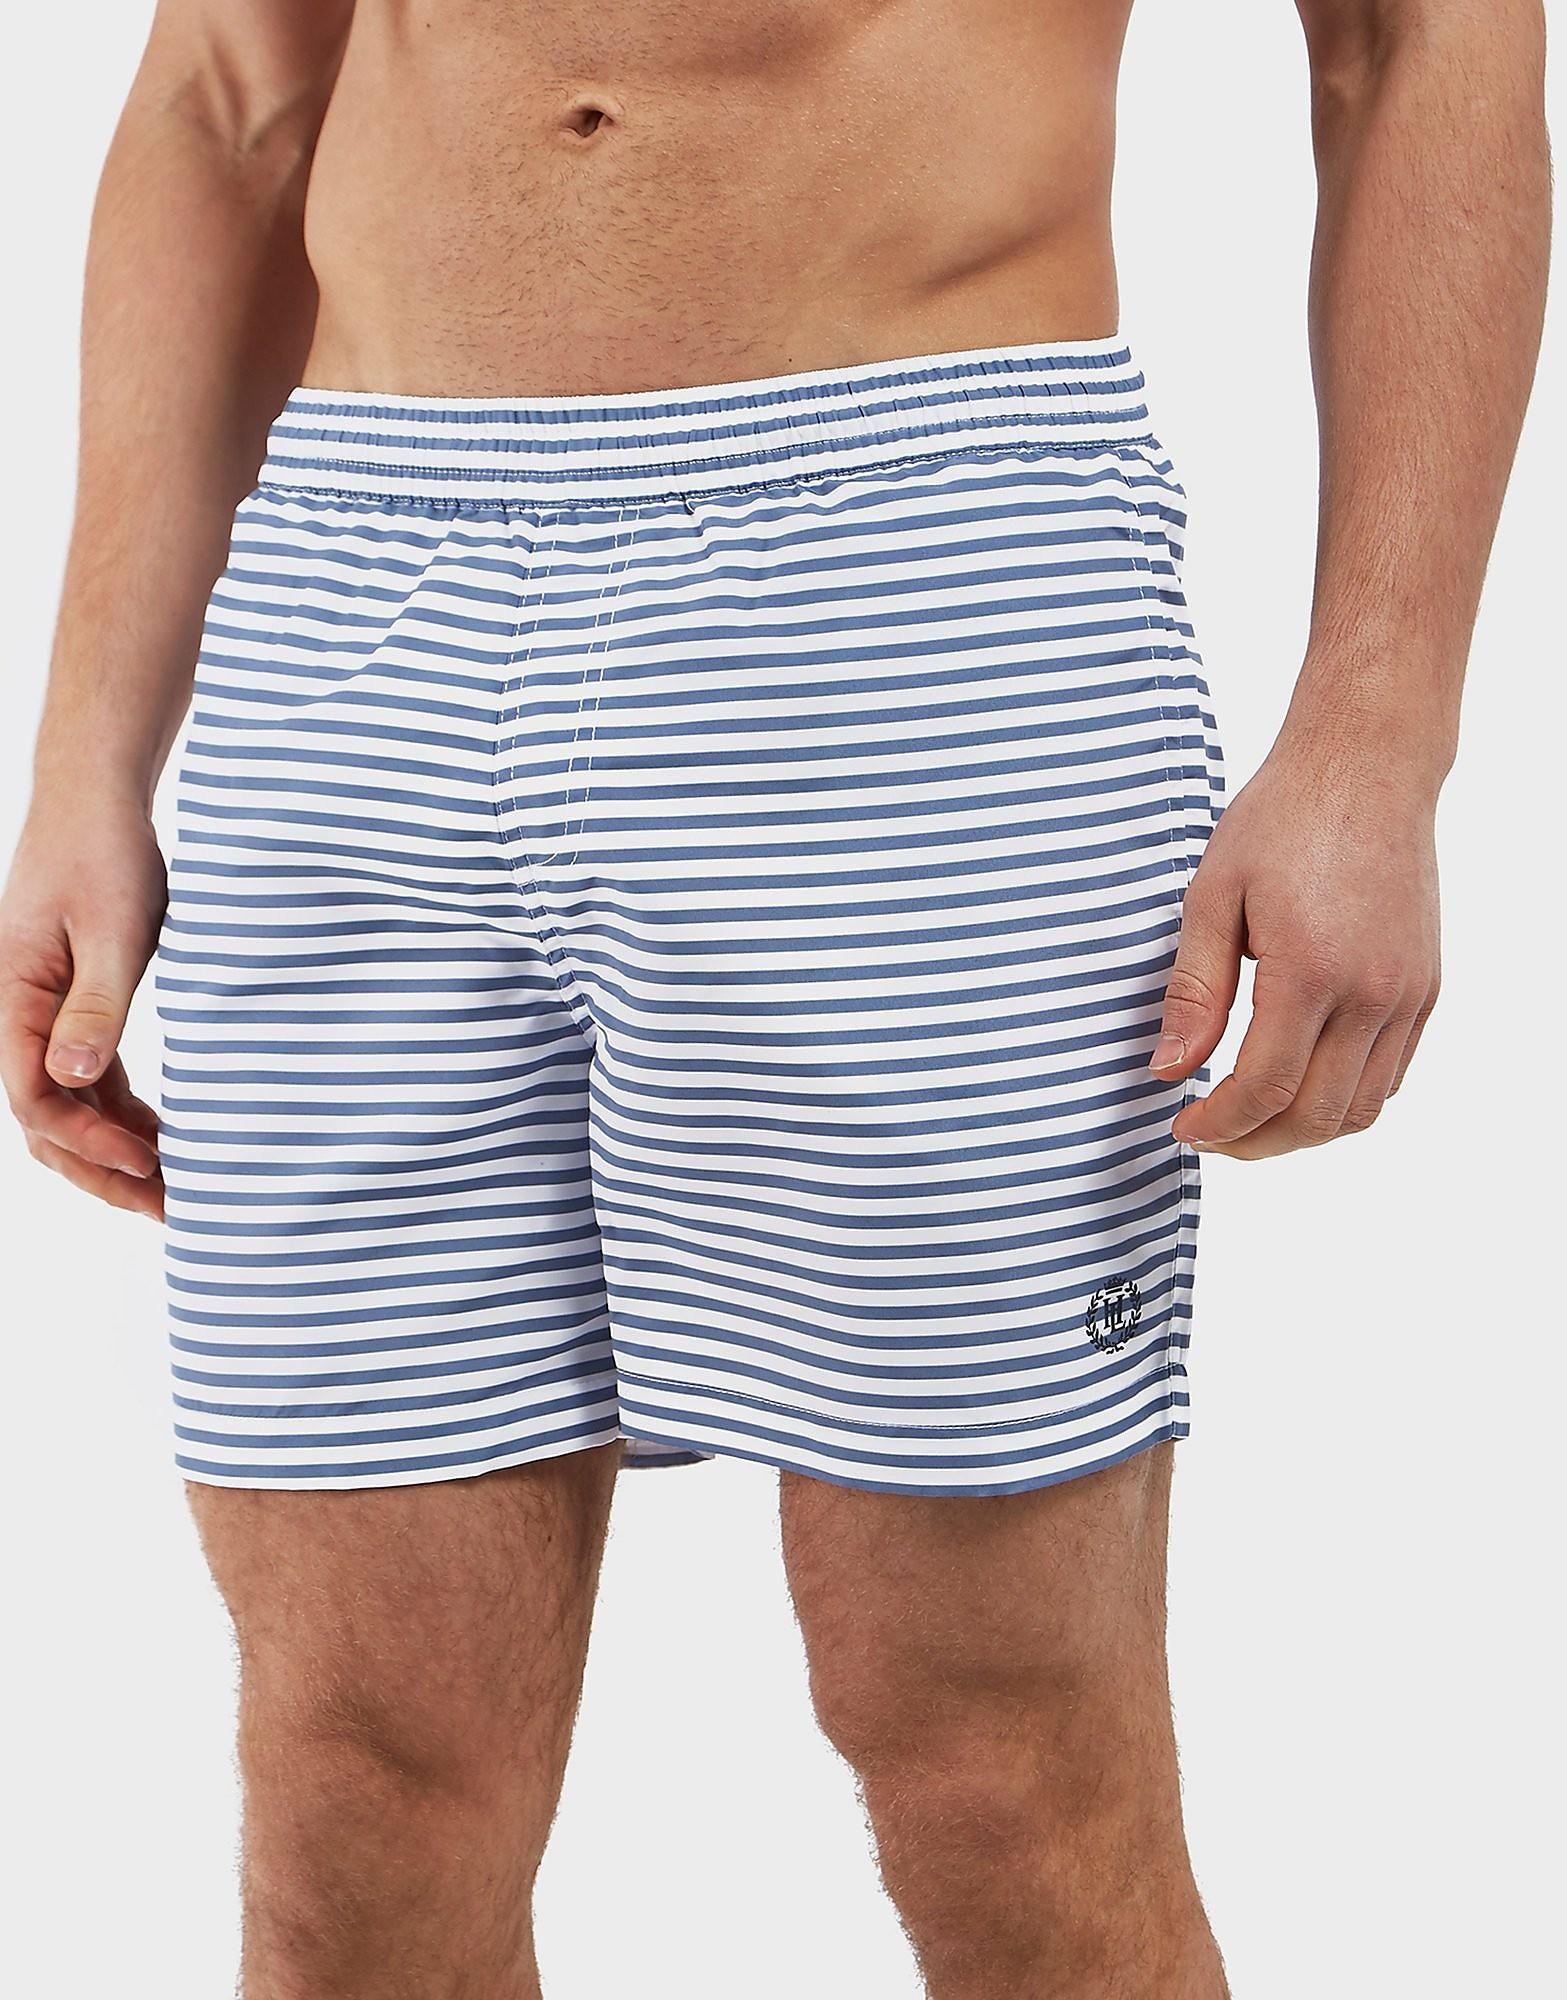 Henri Lloyd Abridge Stripe Swim Shorts